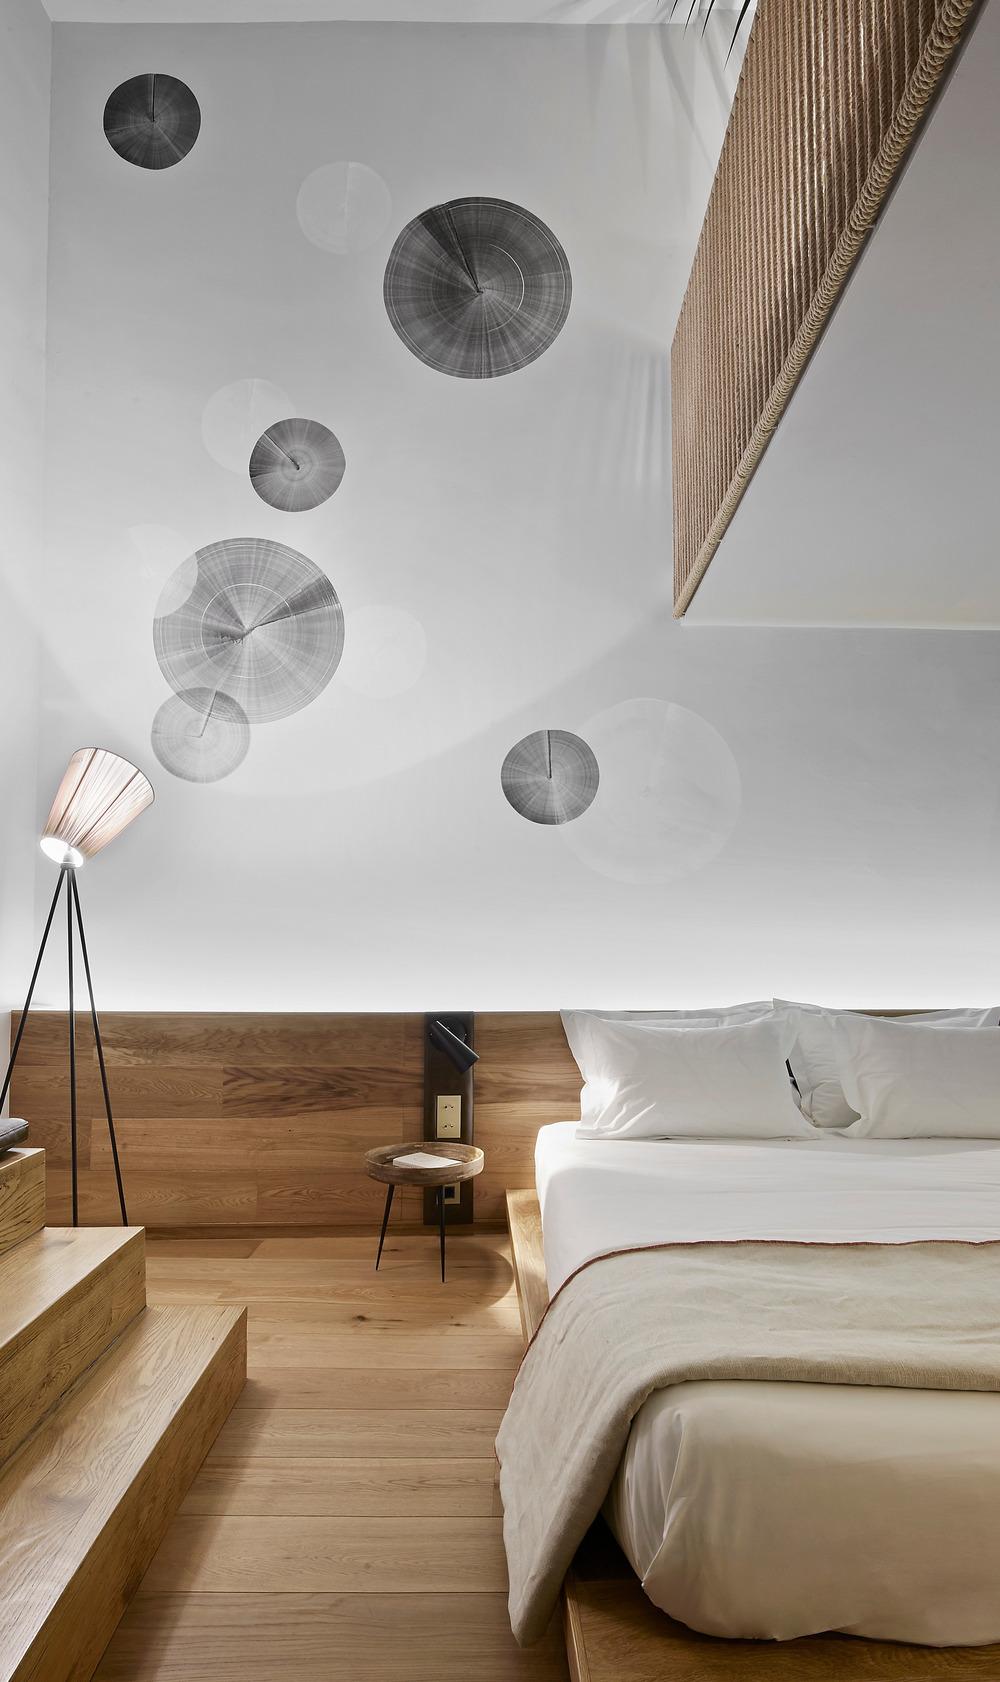 Interior-inspiration-The-Puro-Hotel-in-Palma-7.jpg